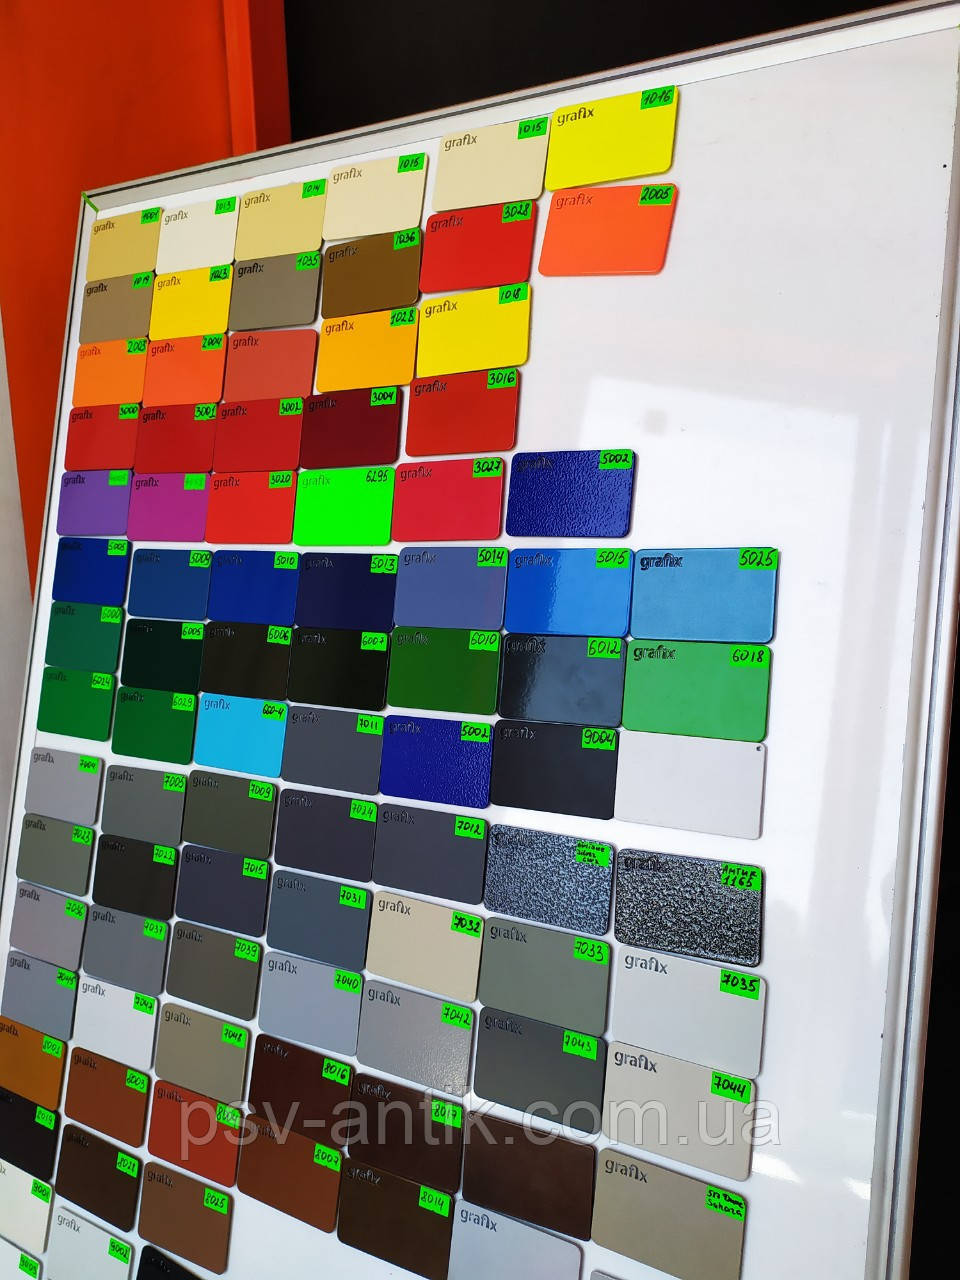 Порошковая краска глянцевая, полиэфирная, архитектурная, 8024